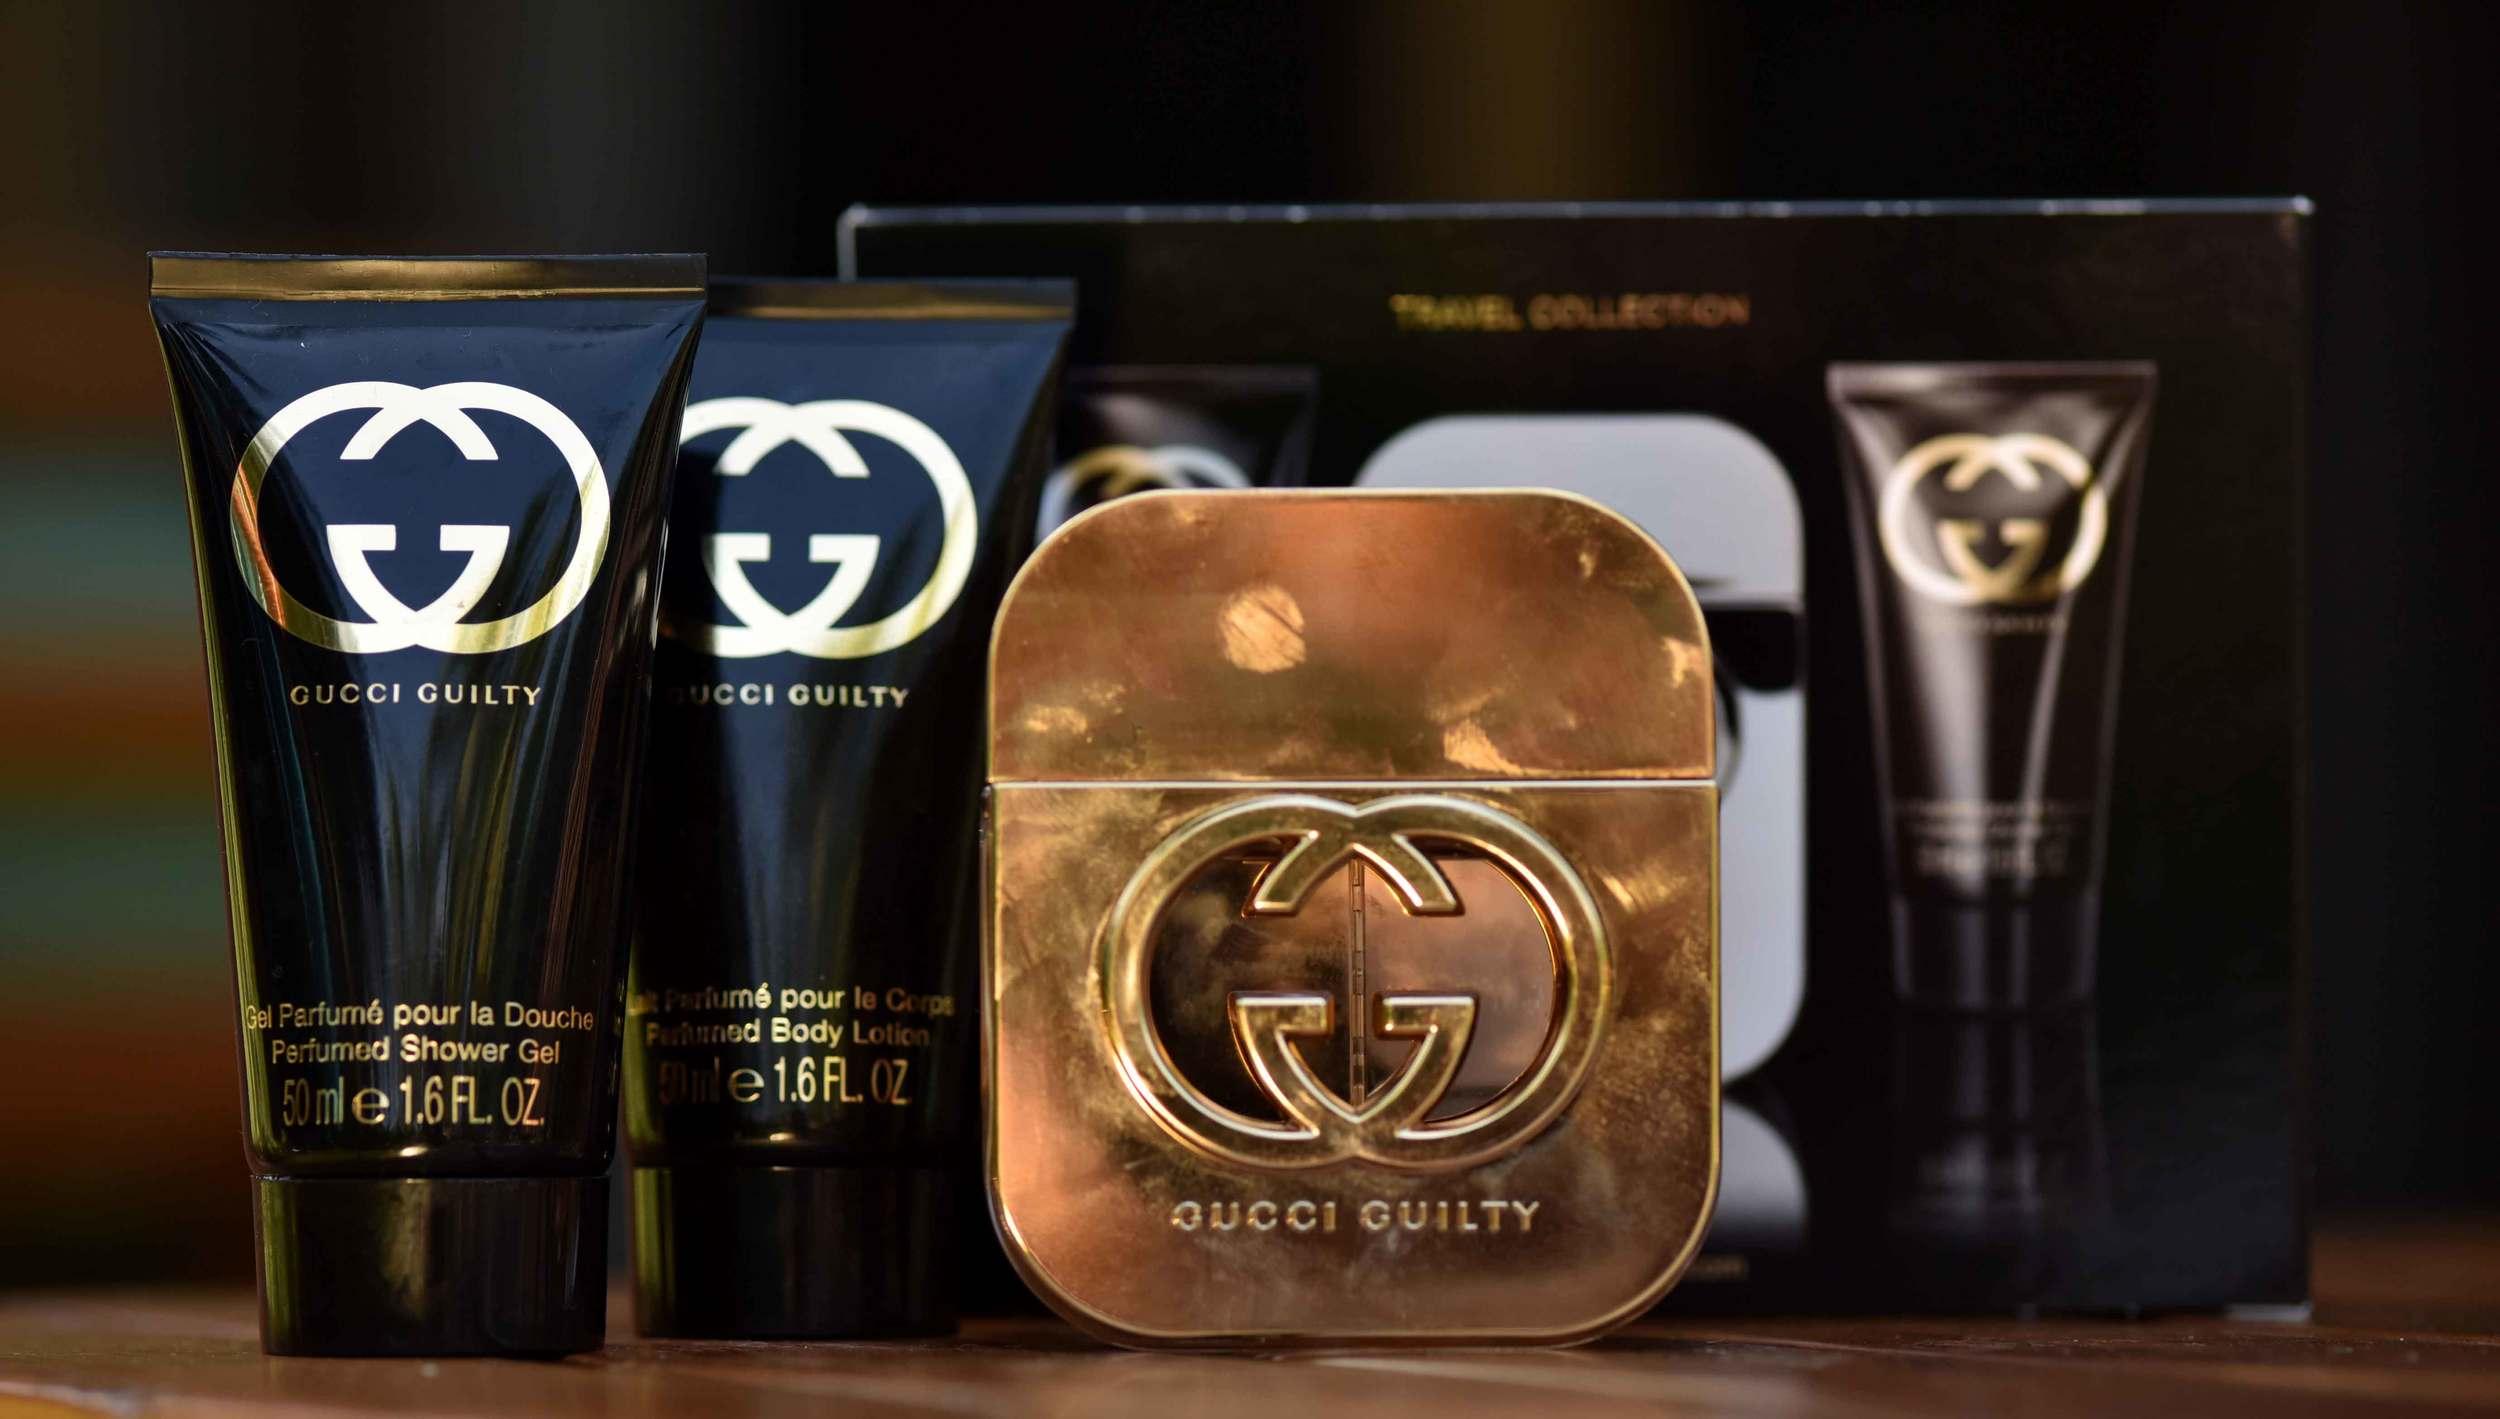 The Gucci Guilty travel set. Image©gunjanvirk